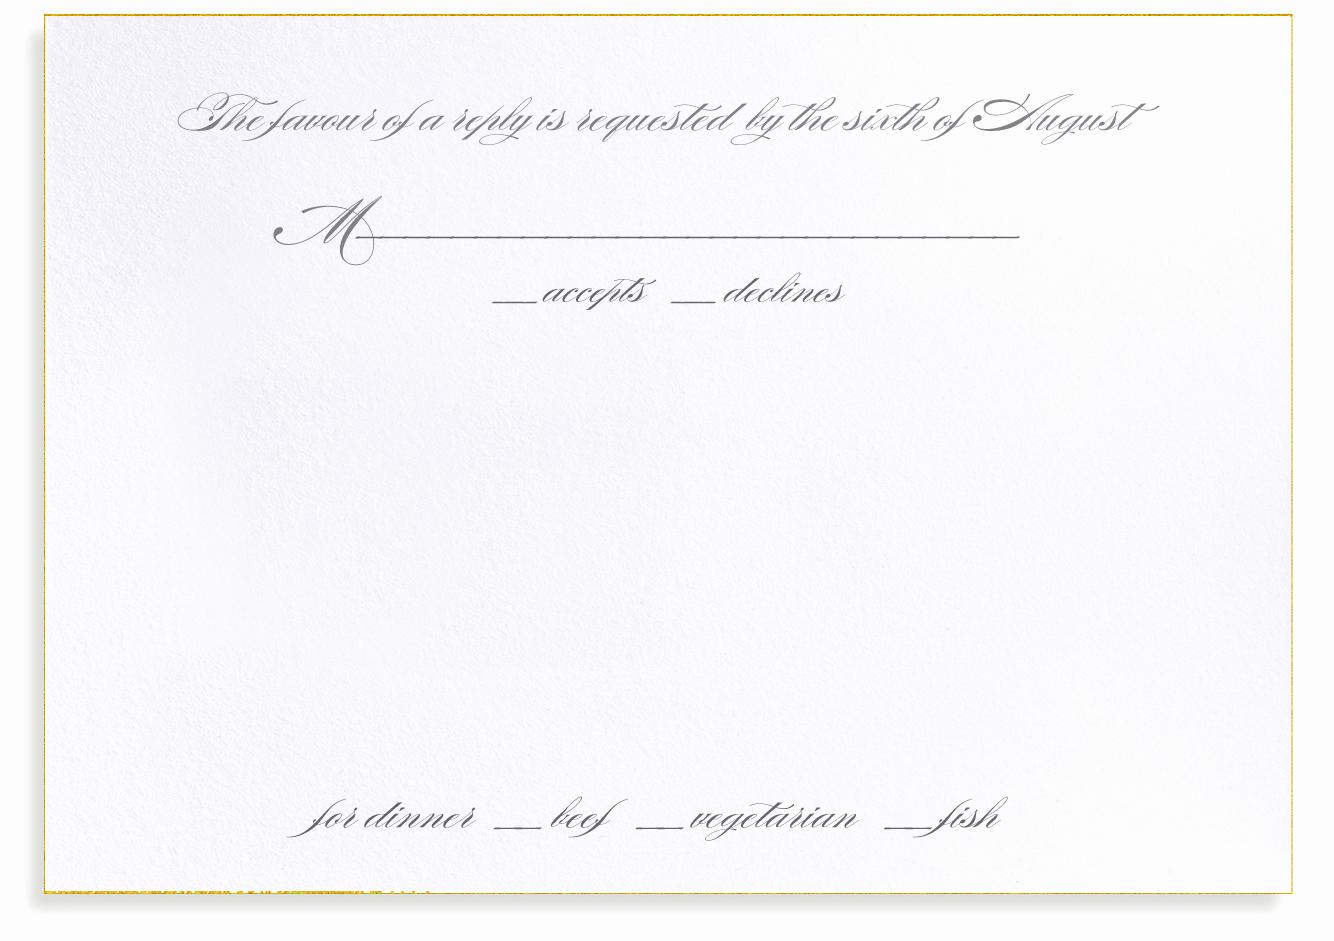 Rsvp Wedding Invitation Wording Elegant Bell Invito Updates Mind Your Rsvps & Qs formal